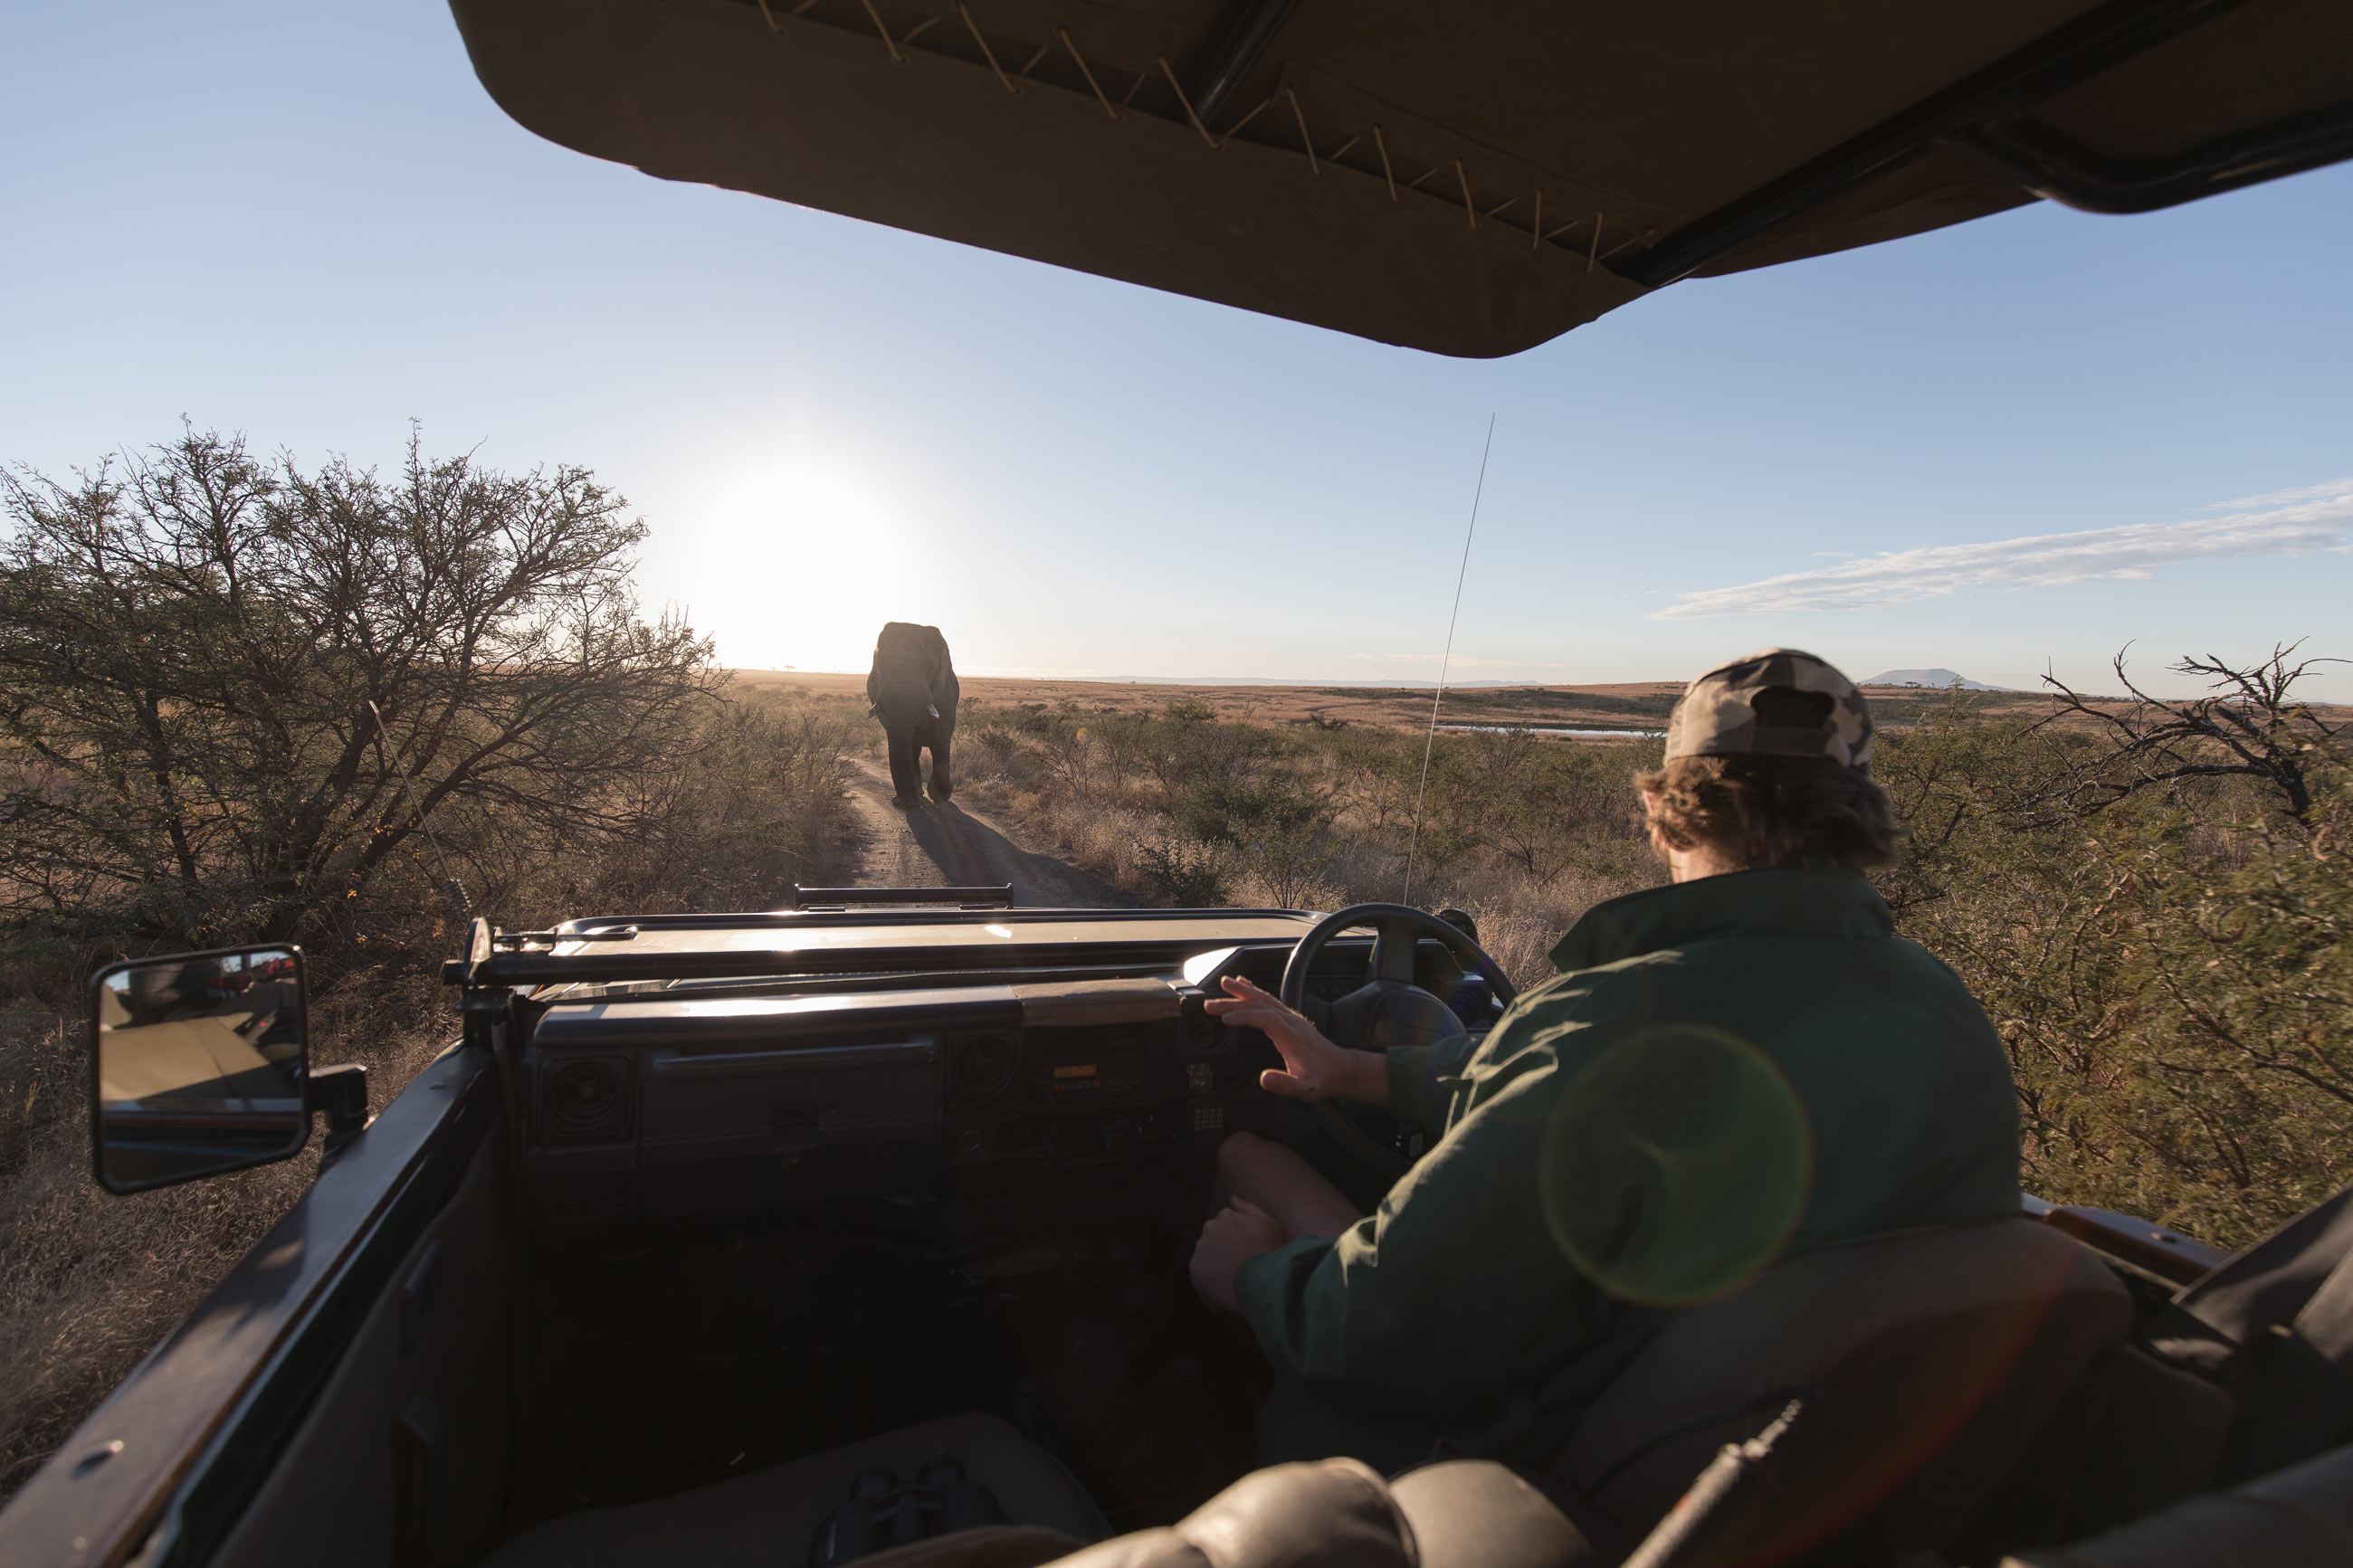 cheetah-ridge-nambiti-game-reserve-south-africa